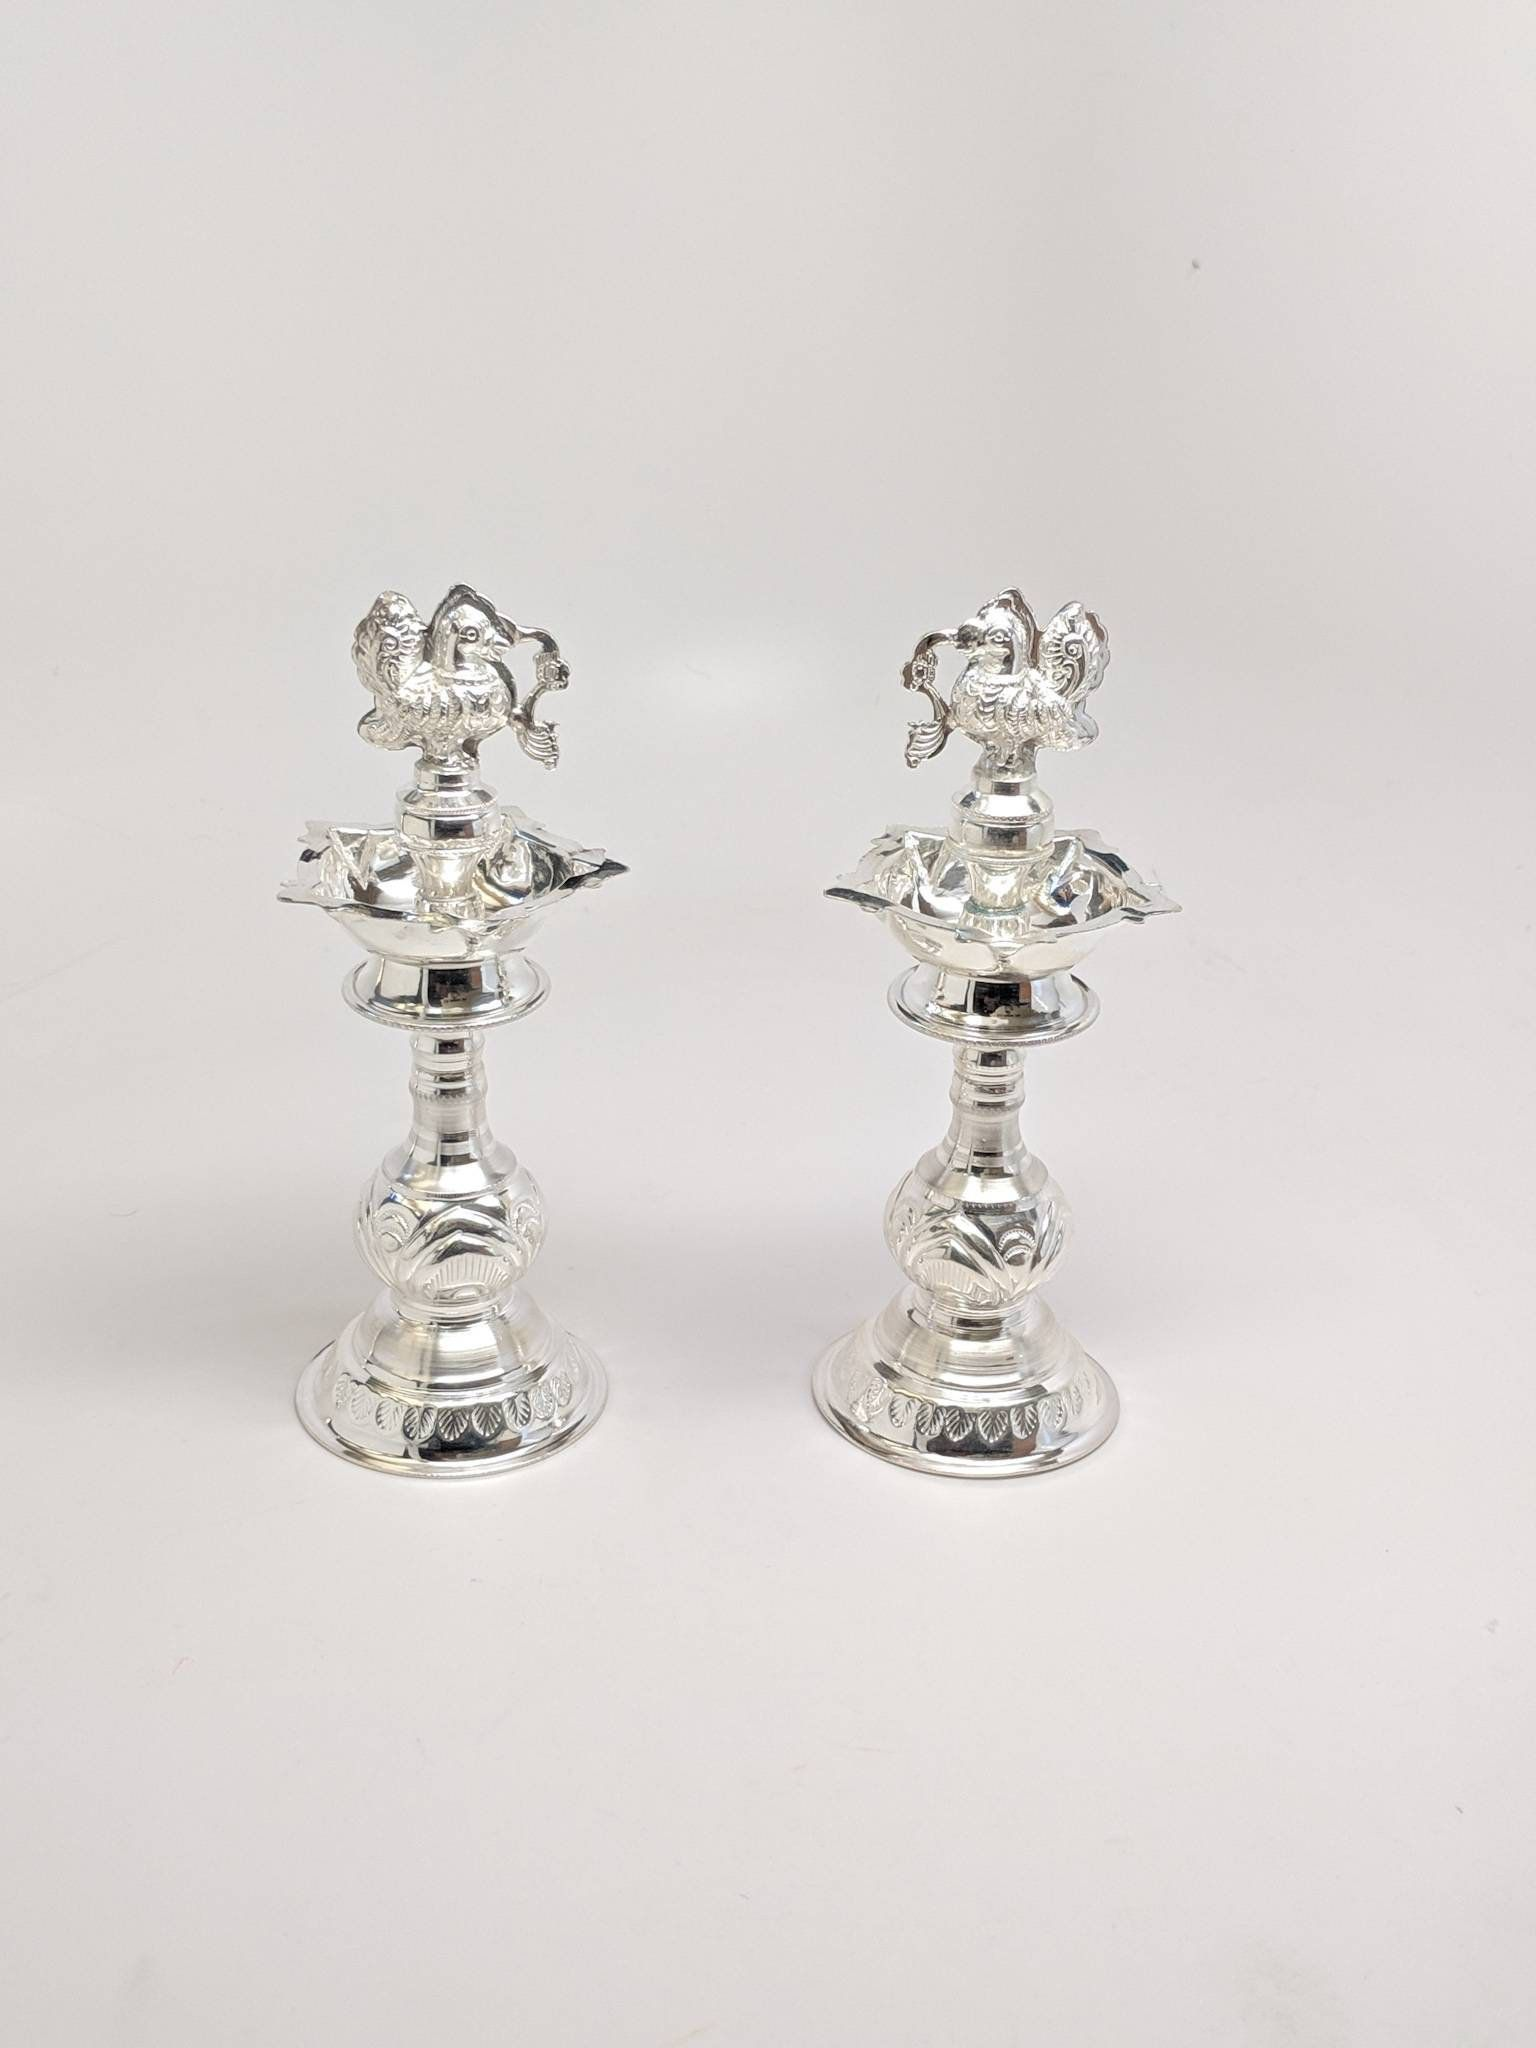 silver lamp designs on 13 silver ideas silver pooja items silver silver lamp 13 silver ideas silver pooja items